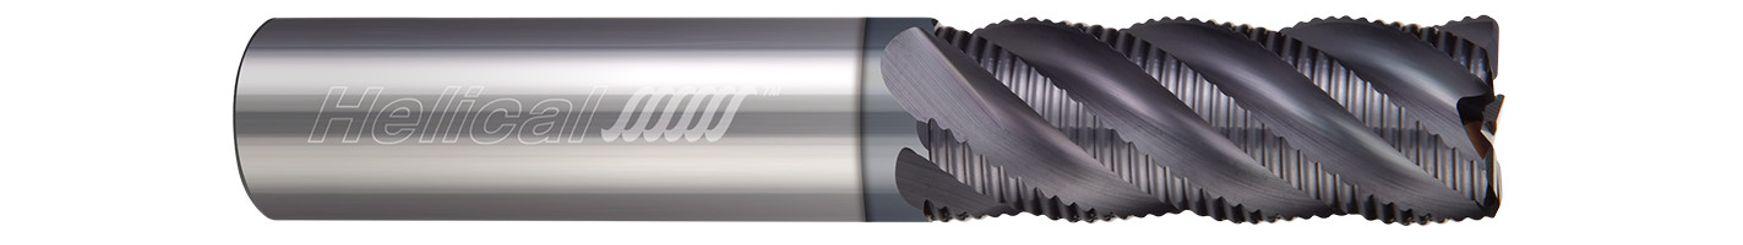 Multi-Flute, Corner Radius - Knuckle Rougher, Variable Pitch